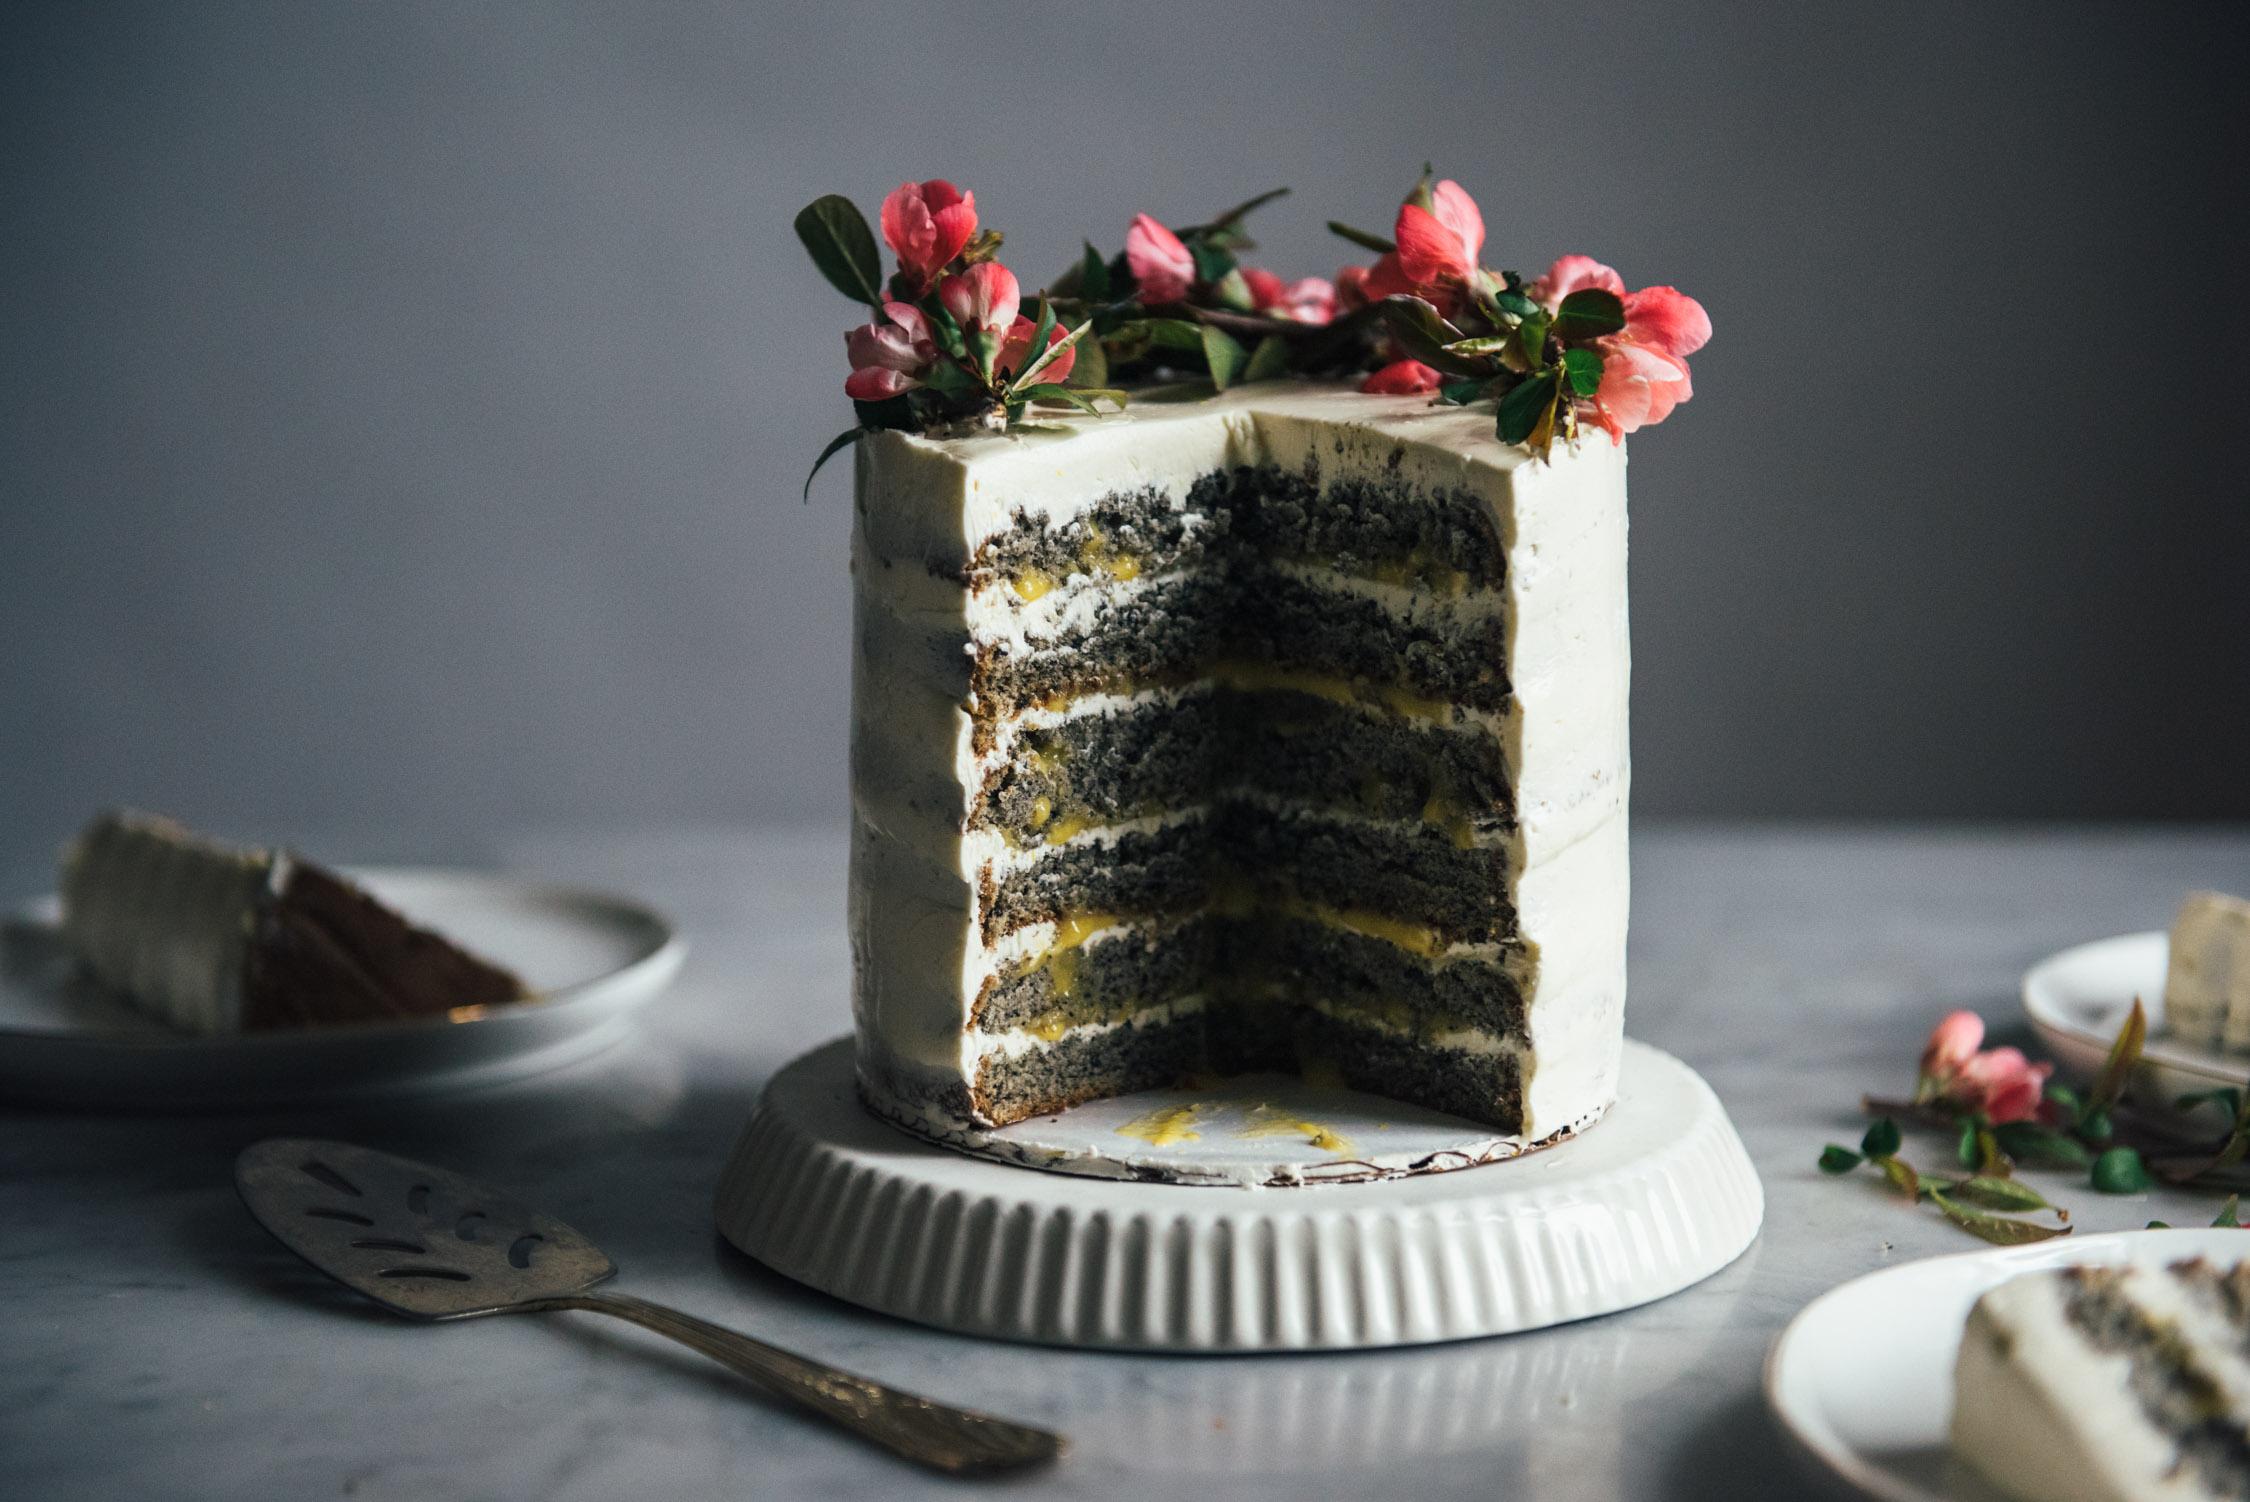 Black Sesame Cake with Citrus Curd